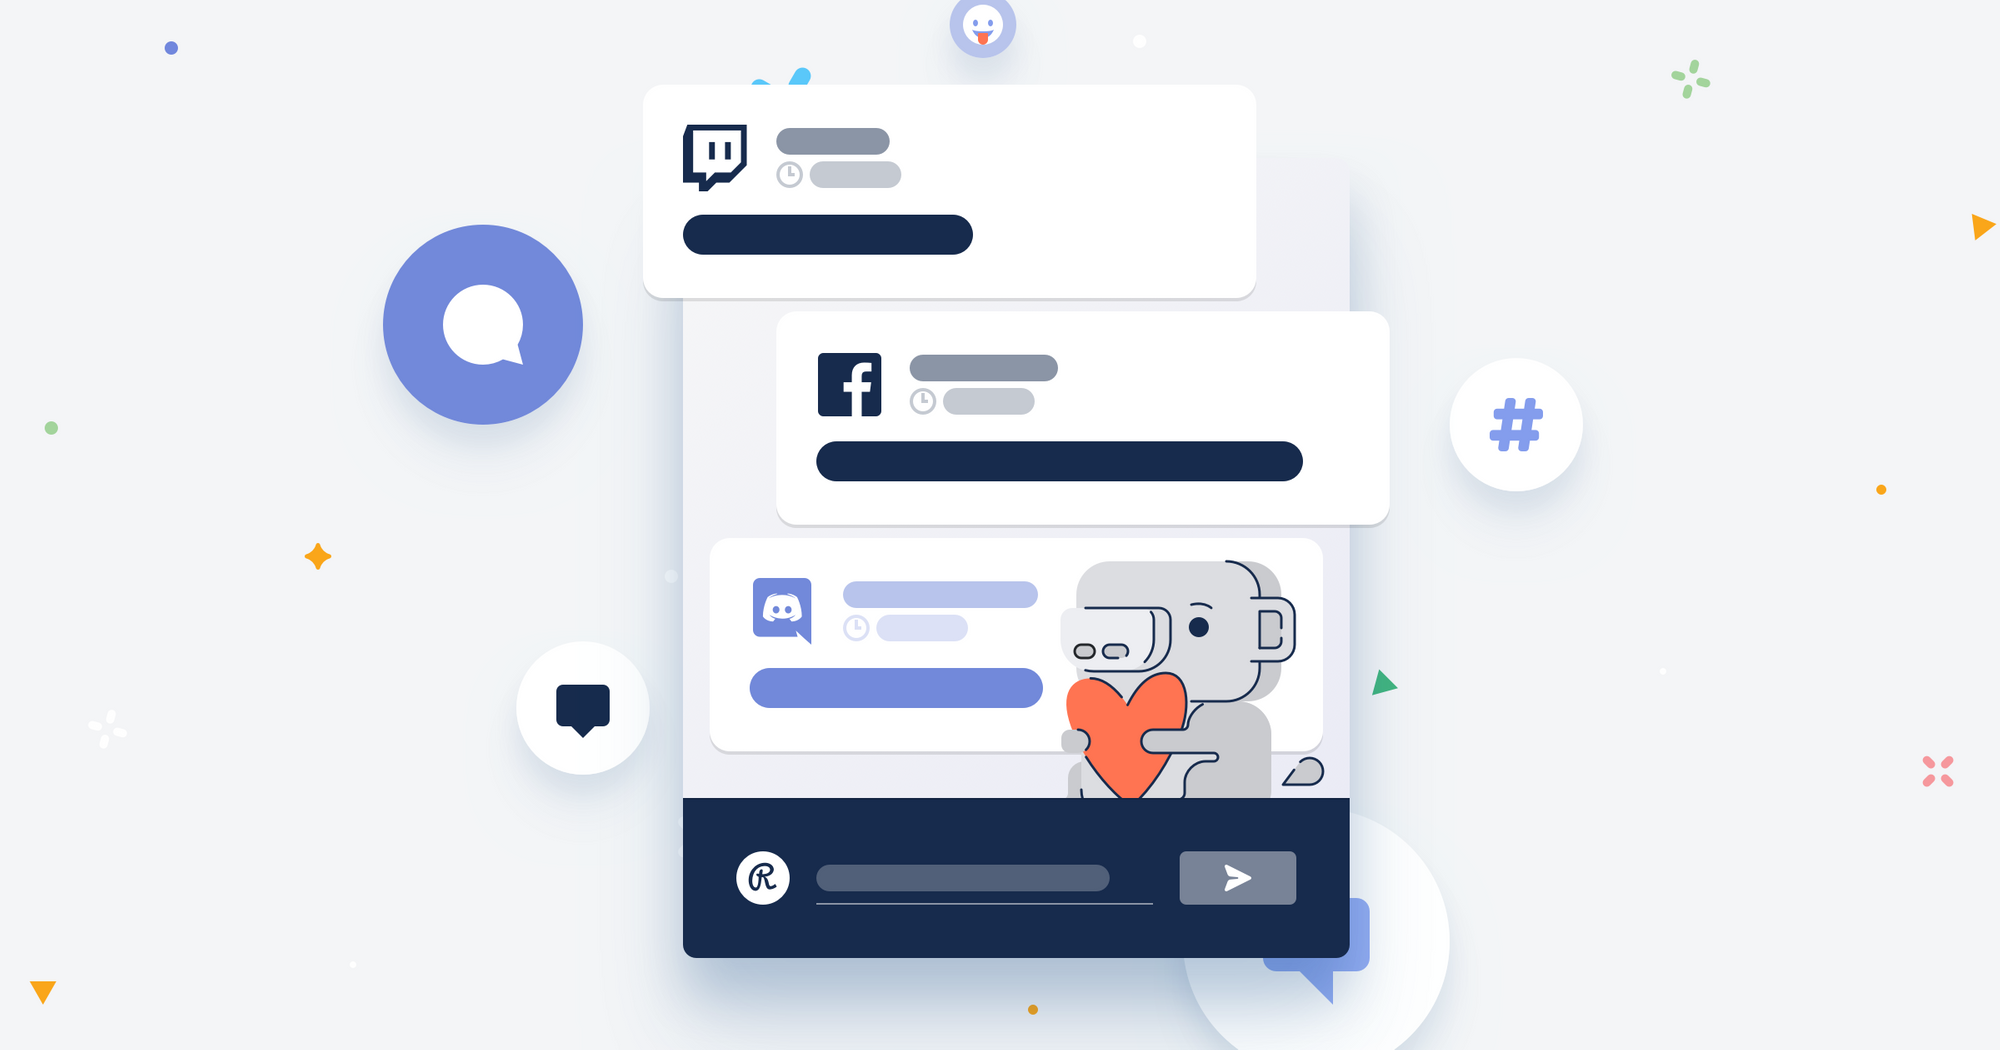 Restream Chat: Cross-platform Communication – Restream Blog